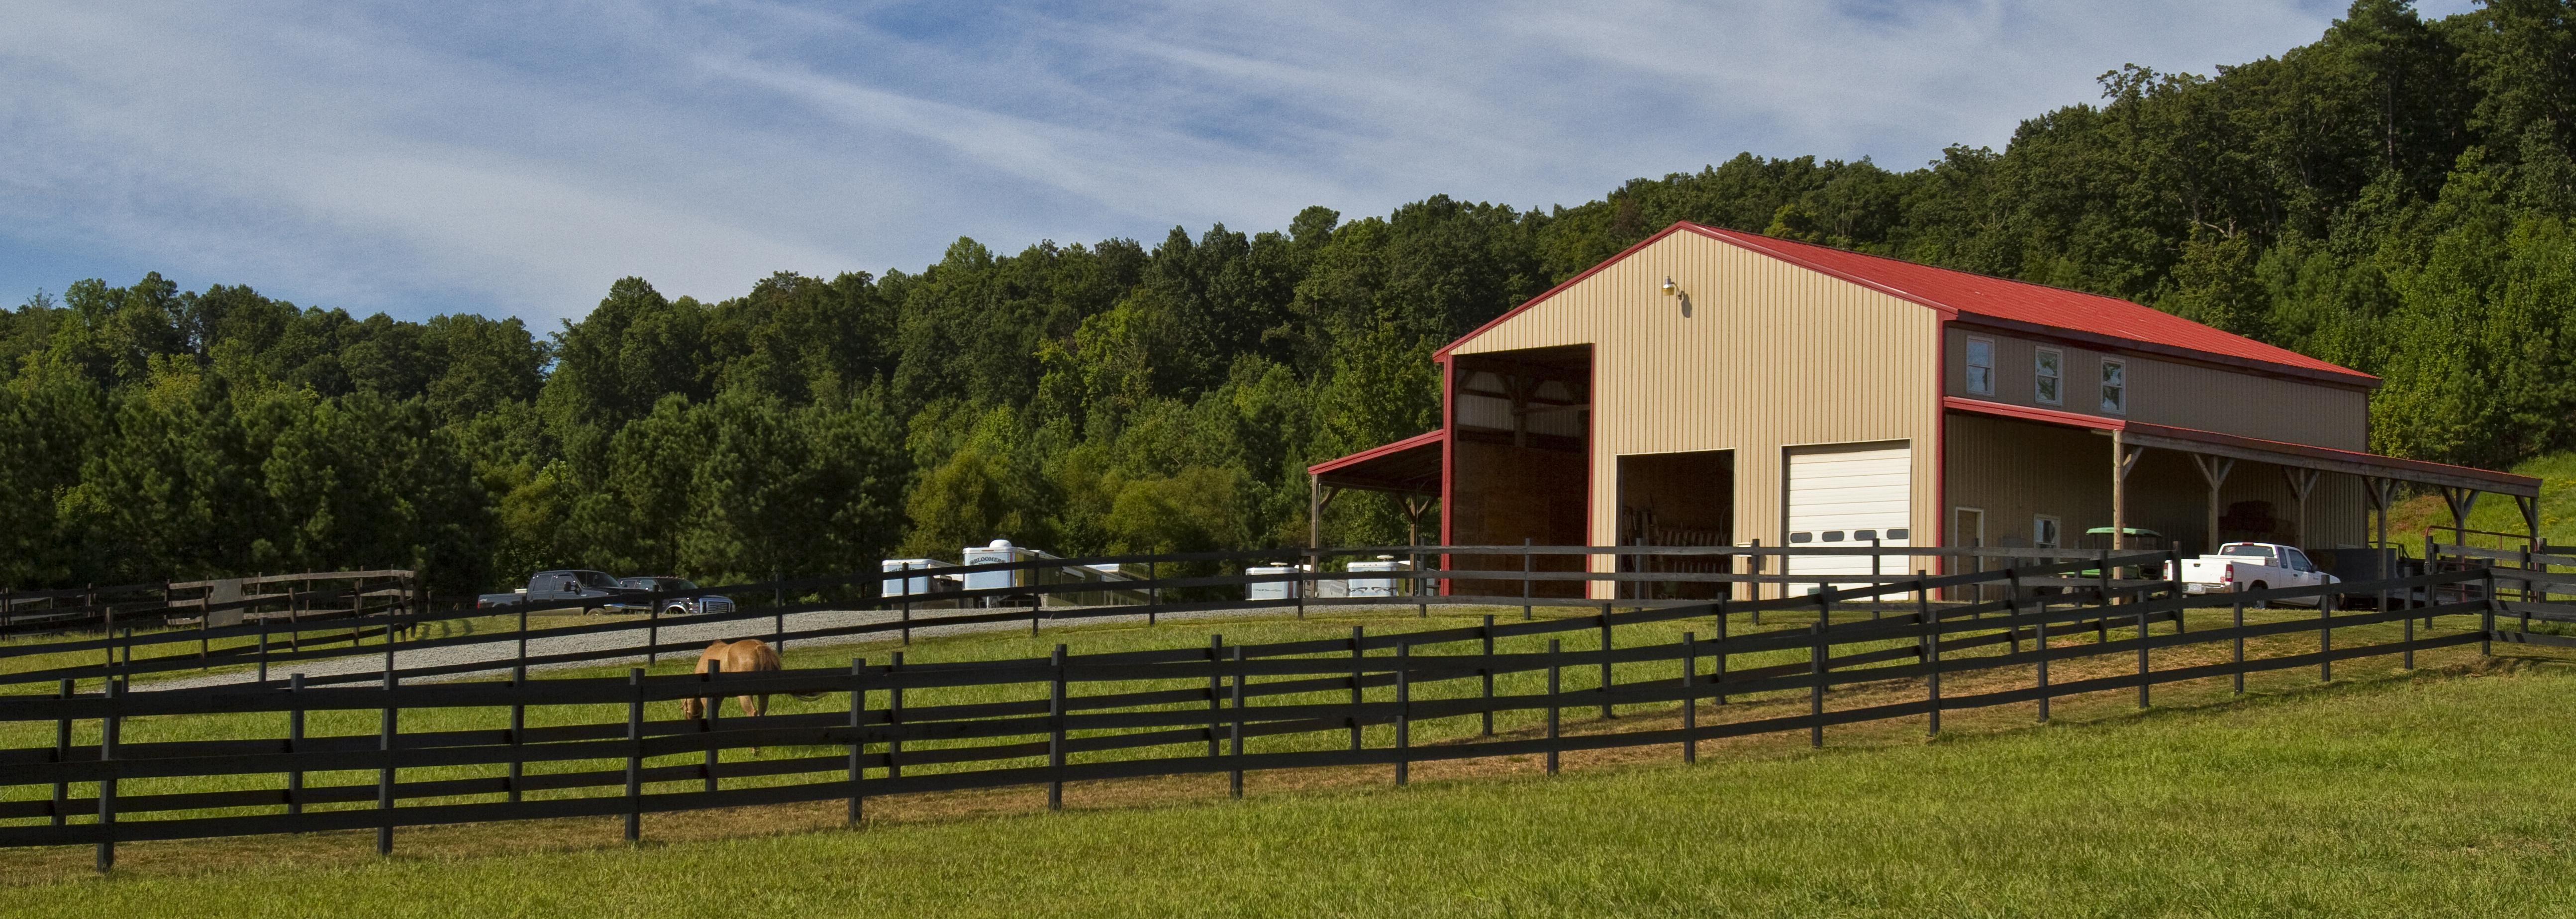 Horse farms legacy farms and ranches north carolina for Horse farm